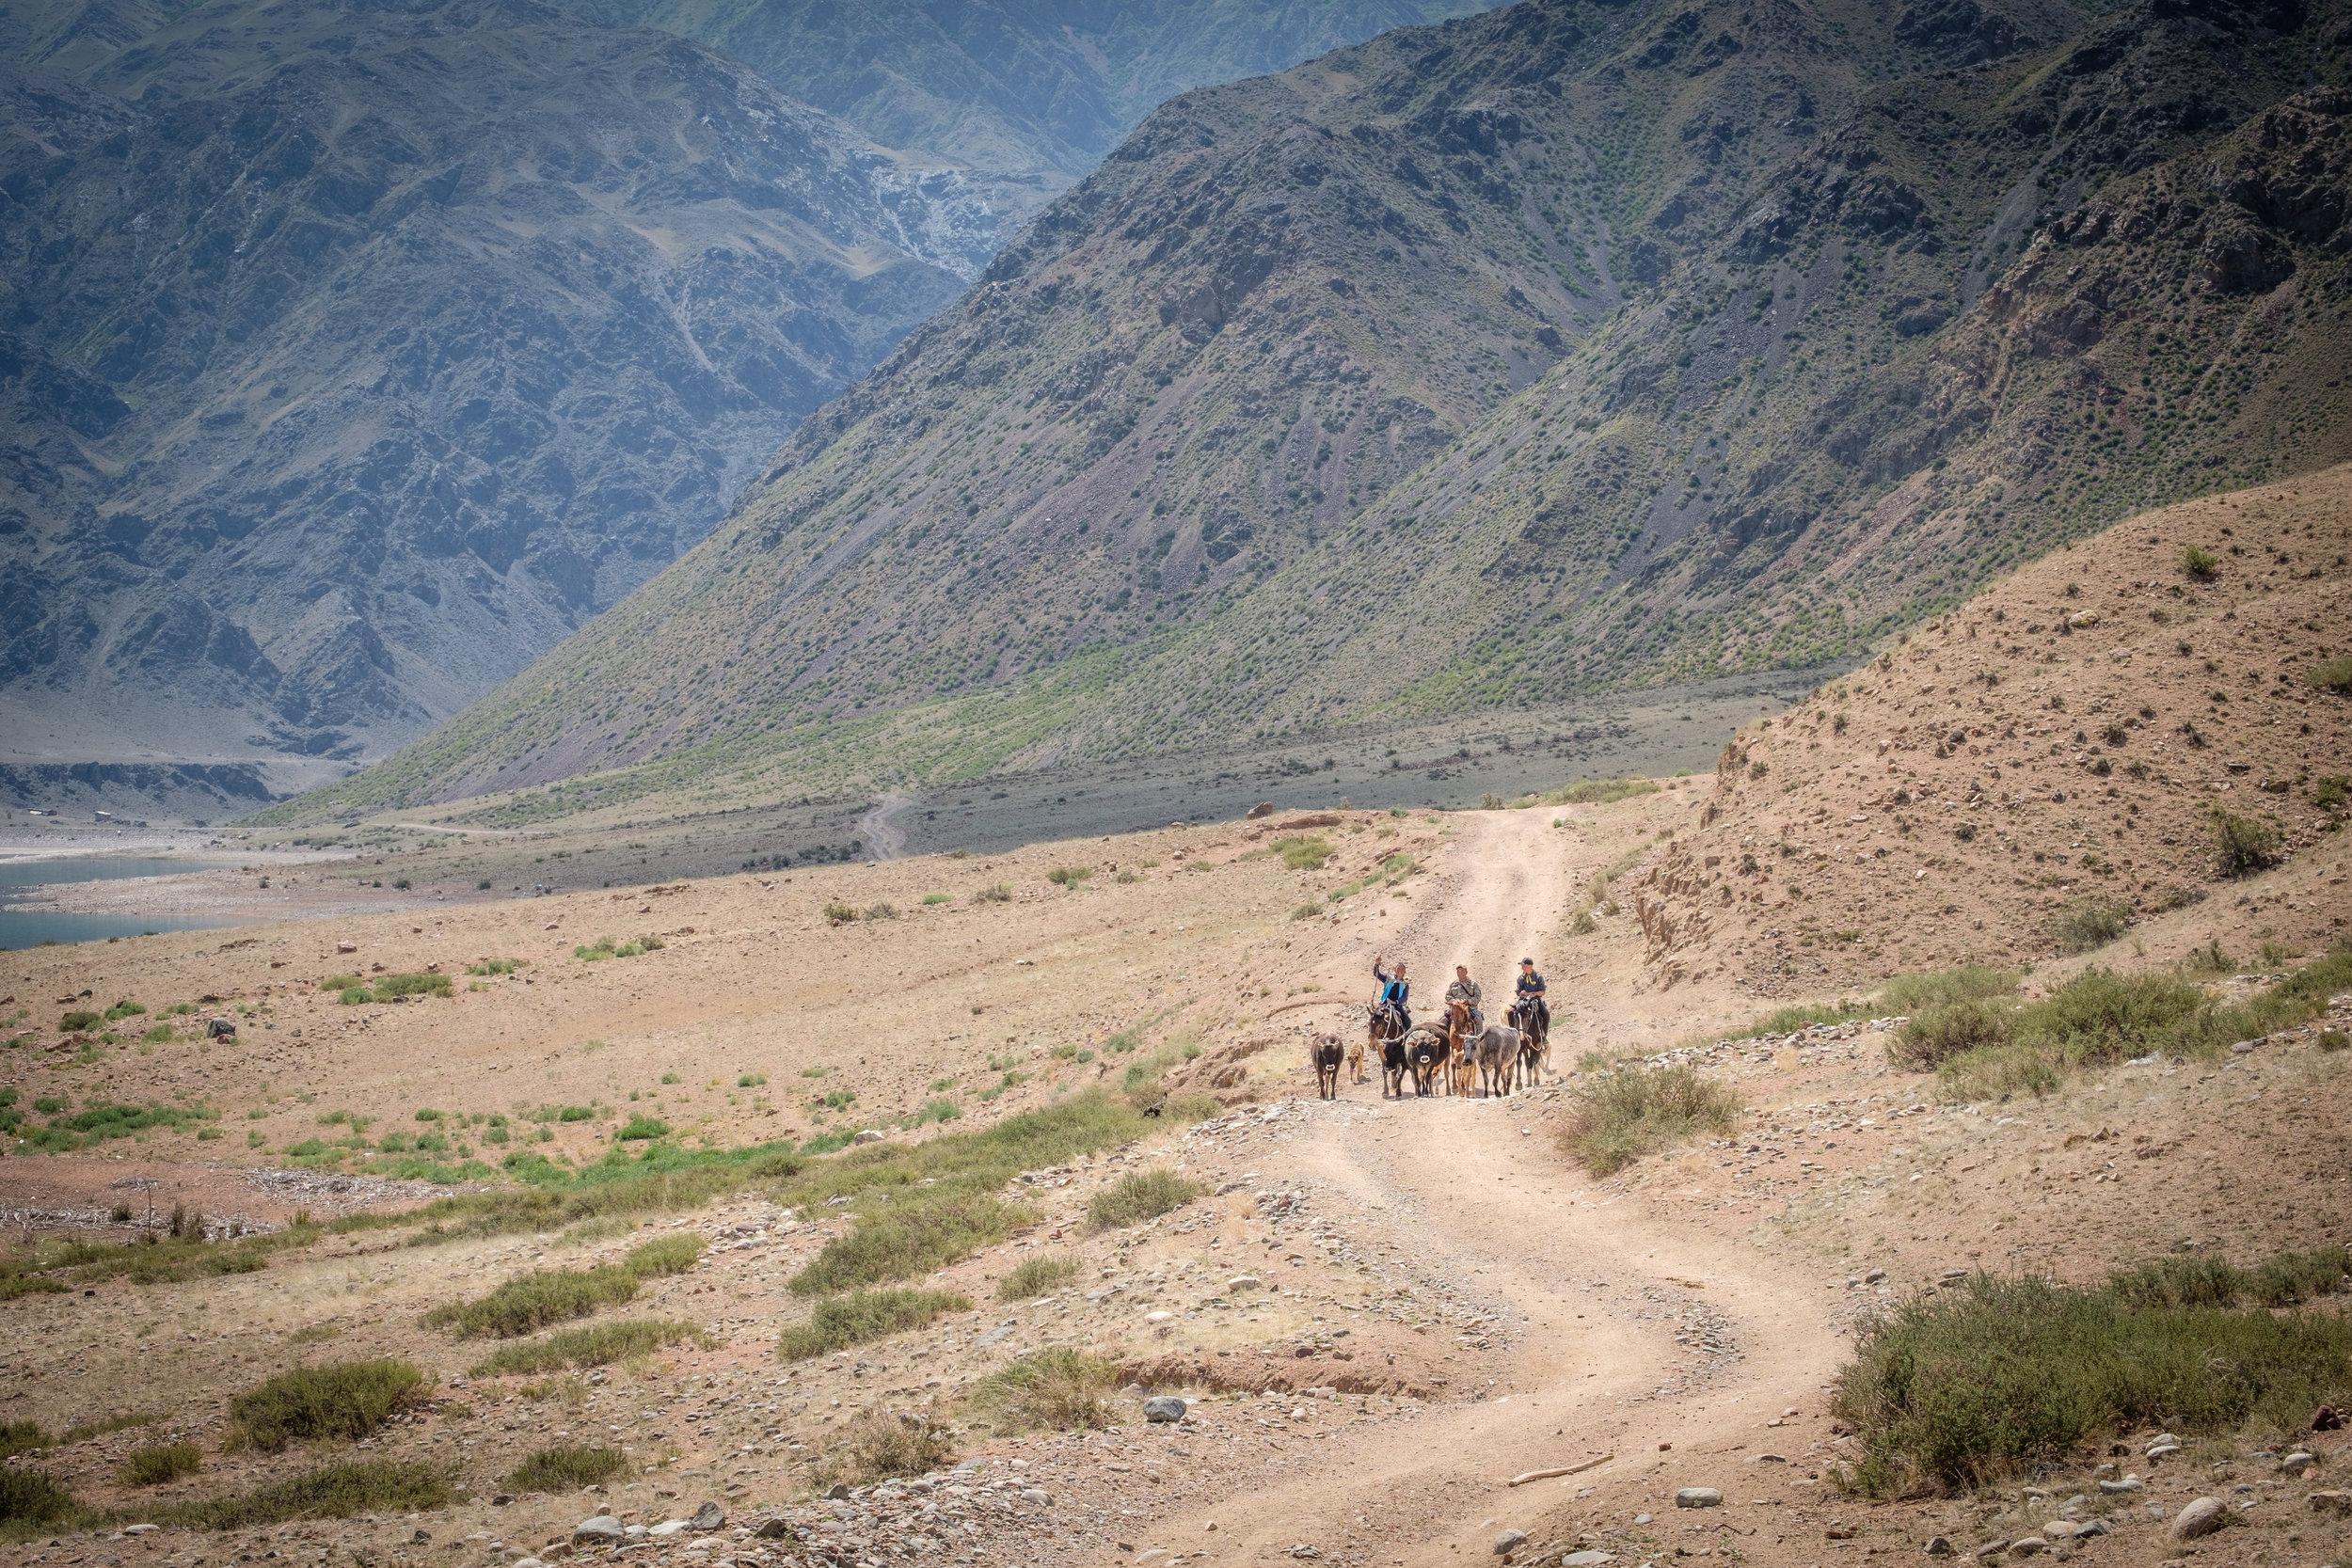 kazakh-corner-route-5077_35466574195_o.jpg